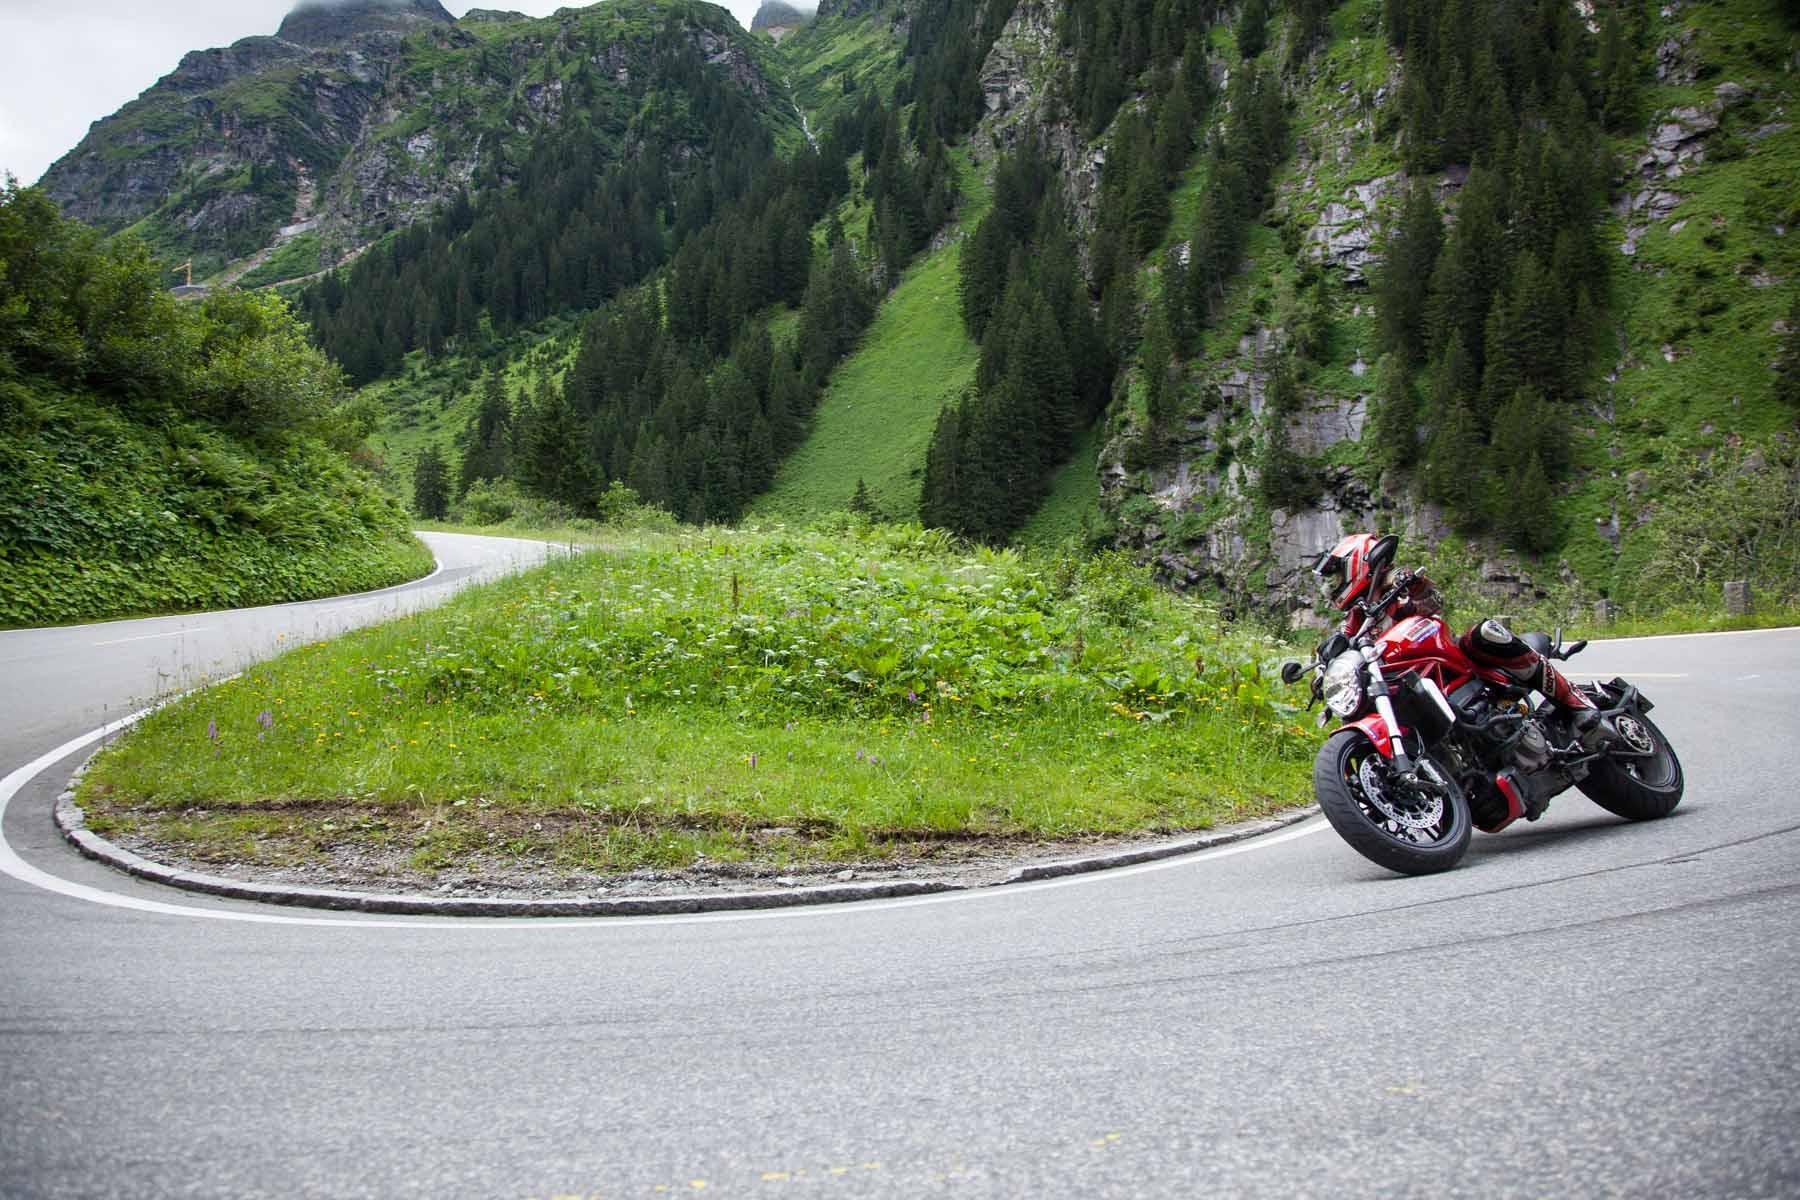 Ducati Monster 1200 Spitzkehre